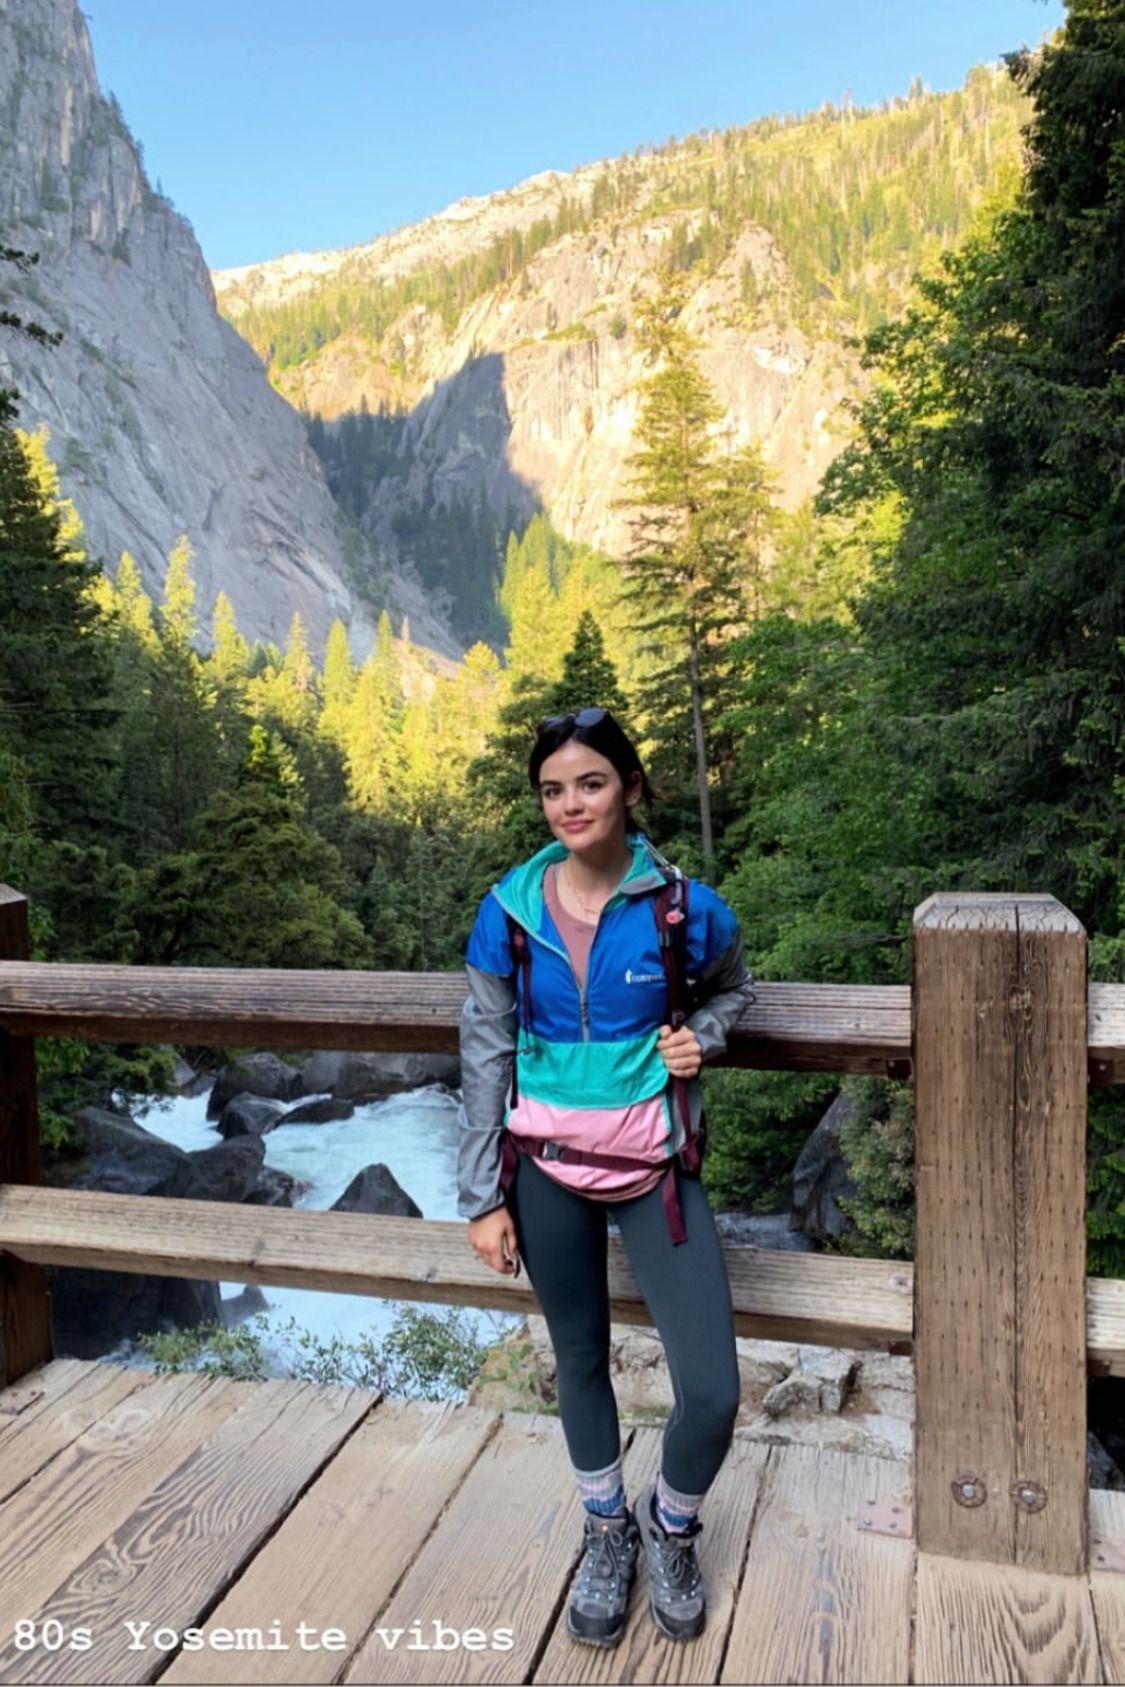 @lucyhale hiking Yosemite in her Cotopaxi Teca